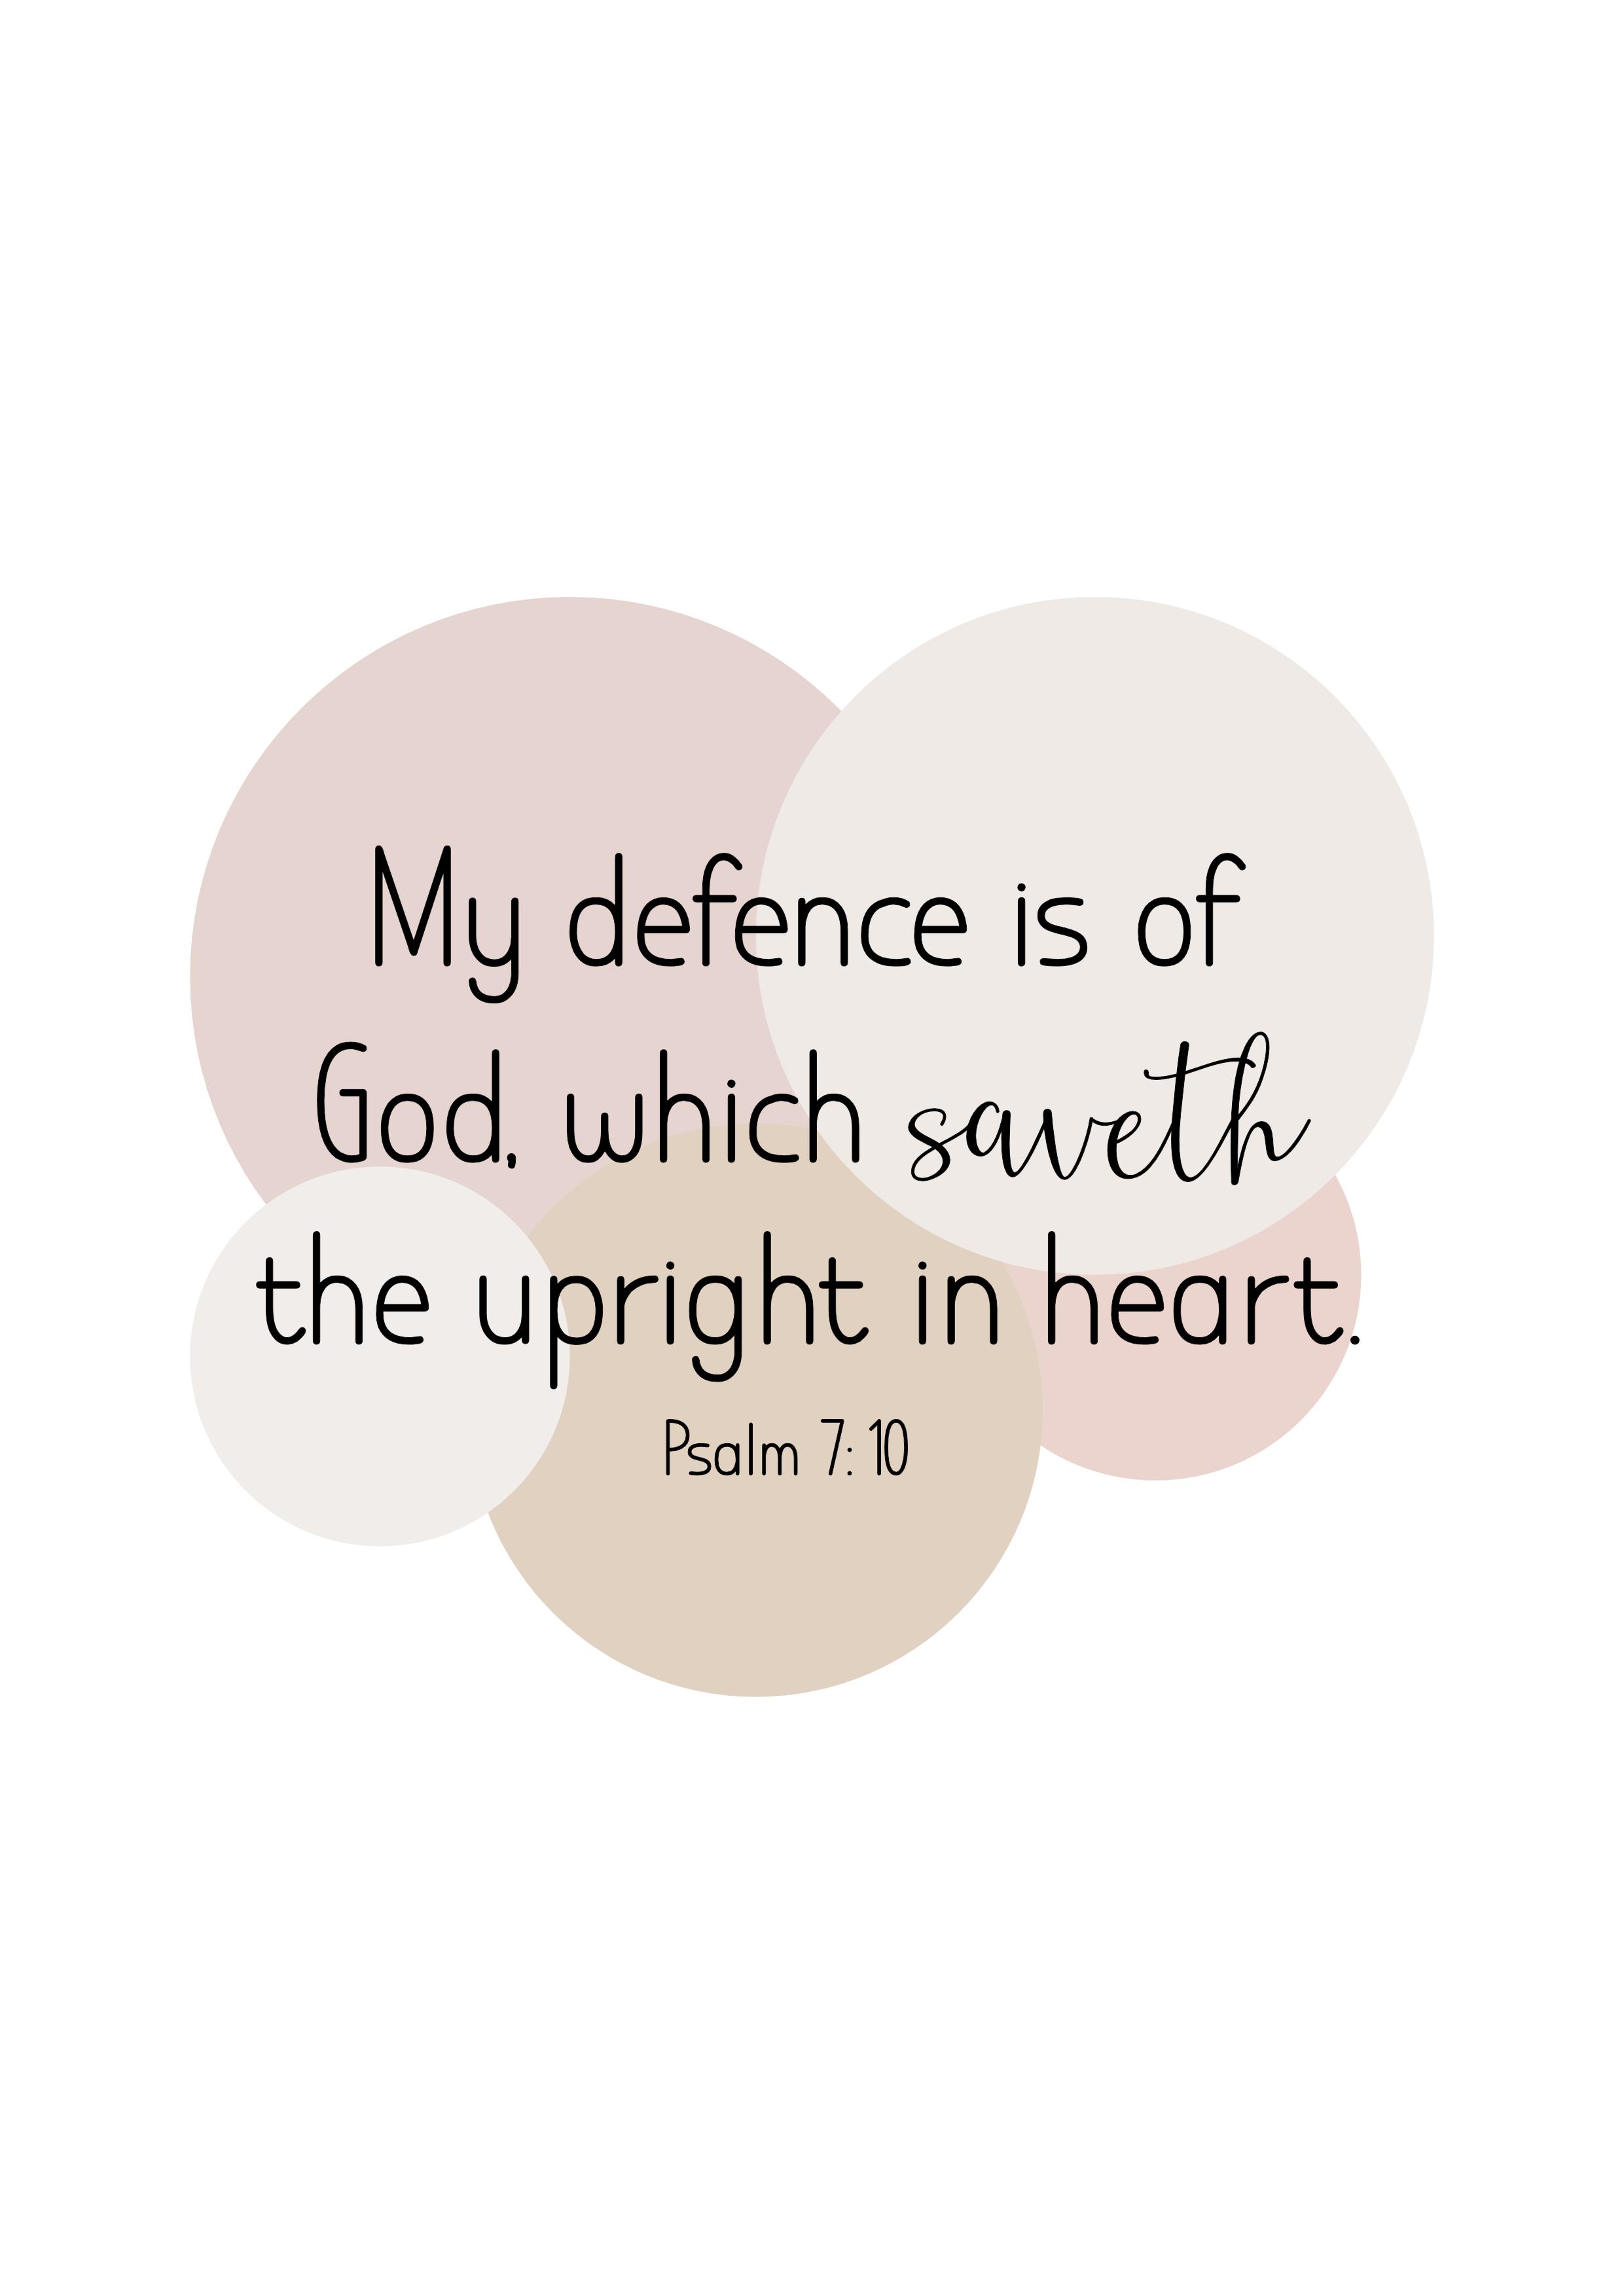 Psalm 7: 10, Poster, JPG, King James Bible 1611 ministries Nederland